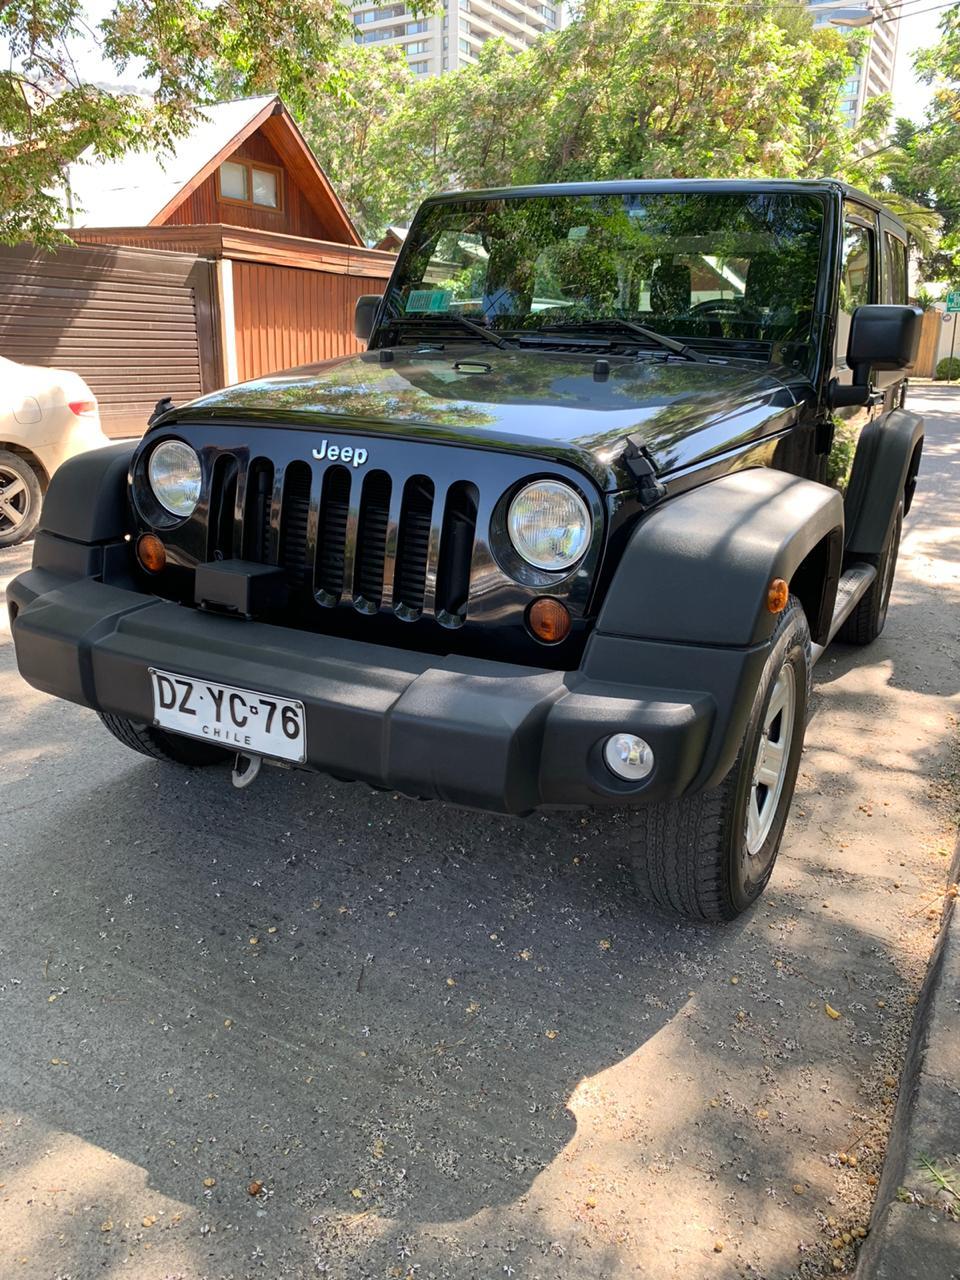 Vehiculos Jeep 2012 Wrangler